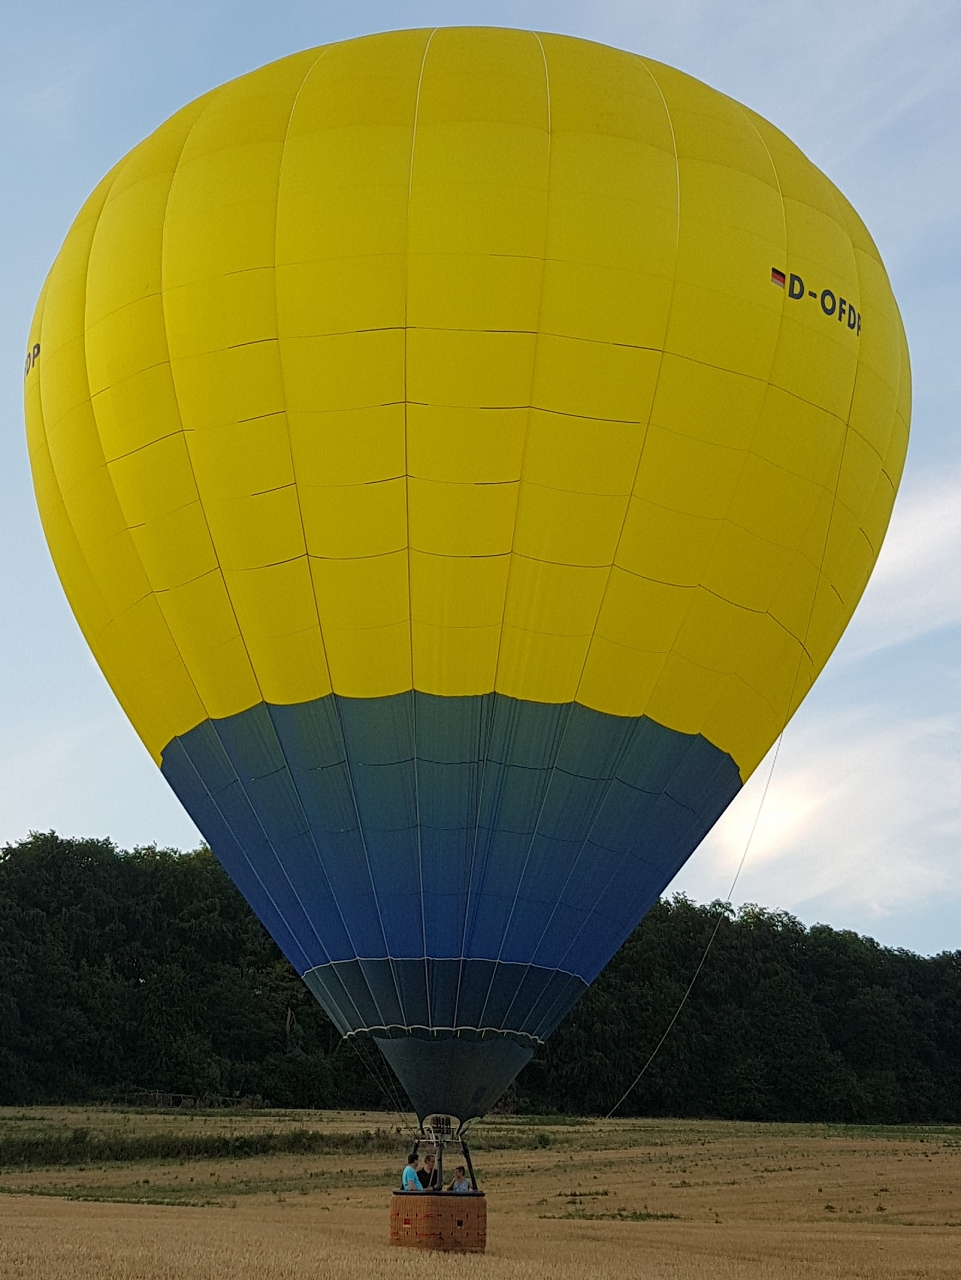 Mein_Ballon_D-OFDP_02